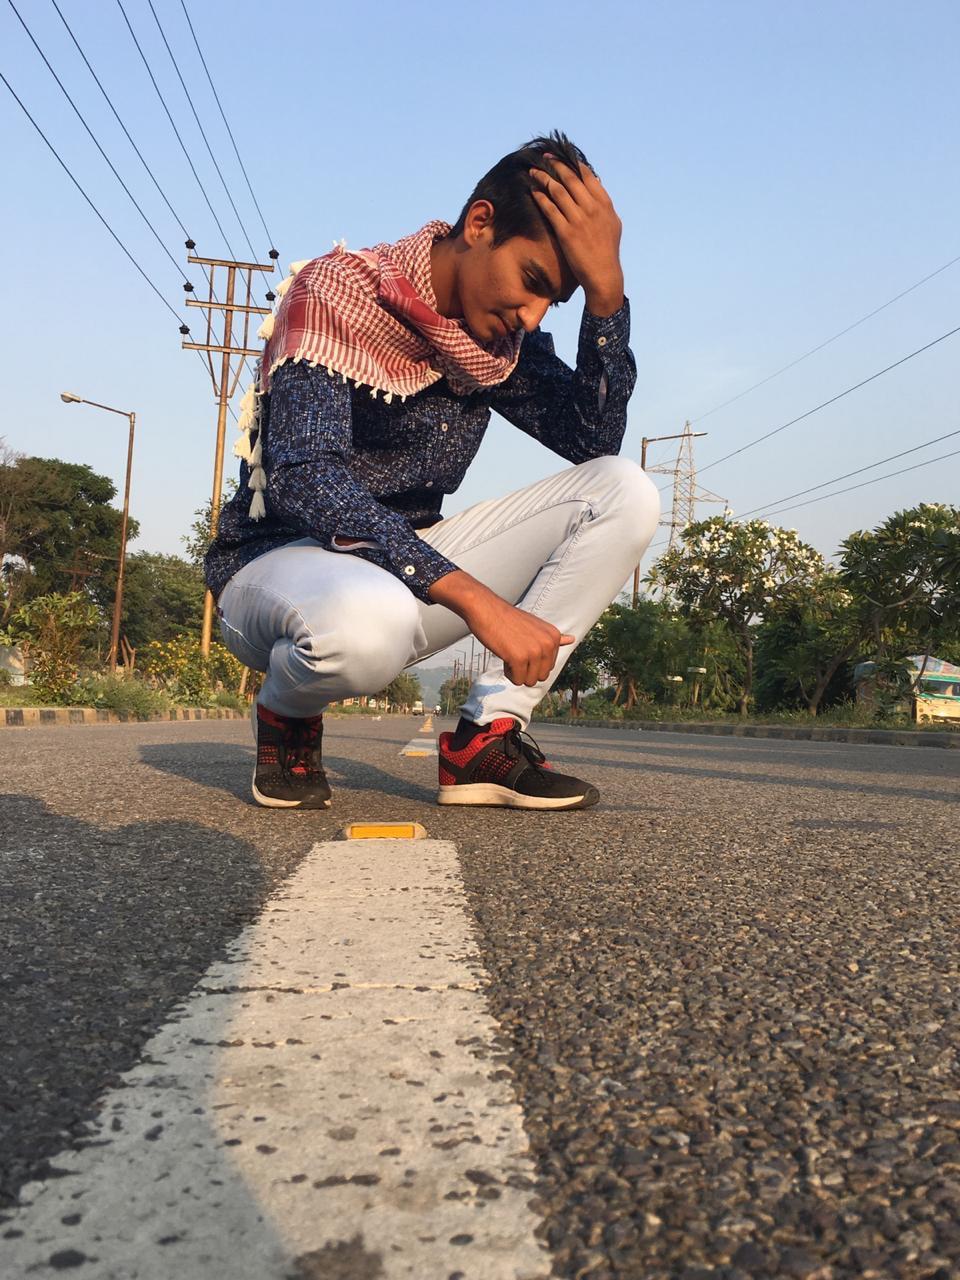 Go to Aryan Kamboj's profile